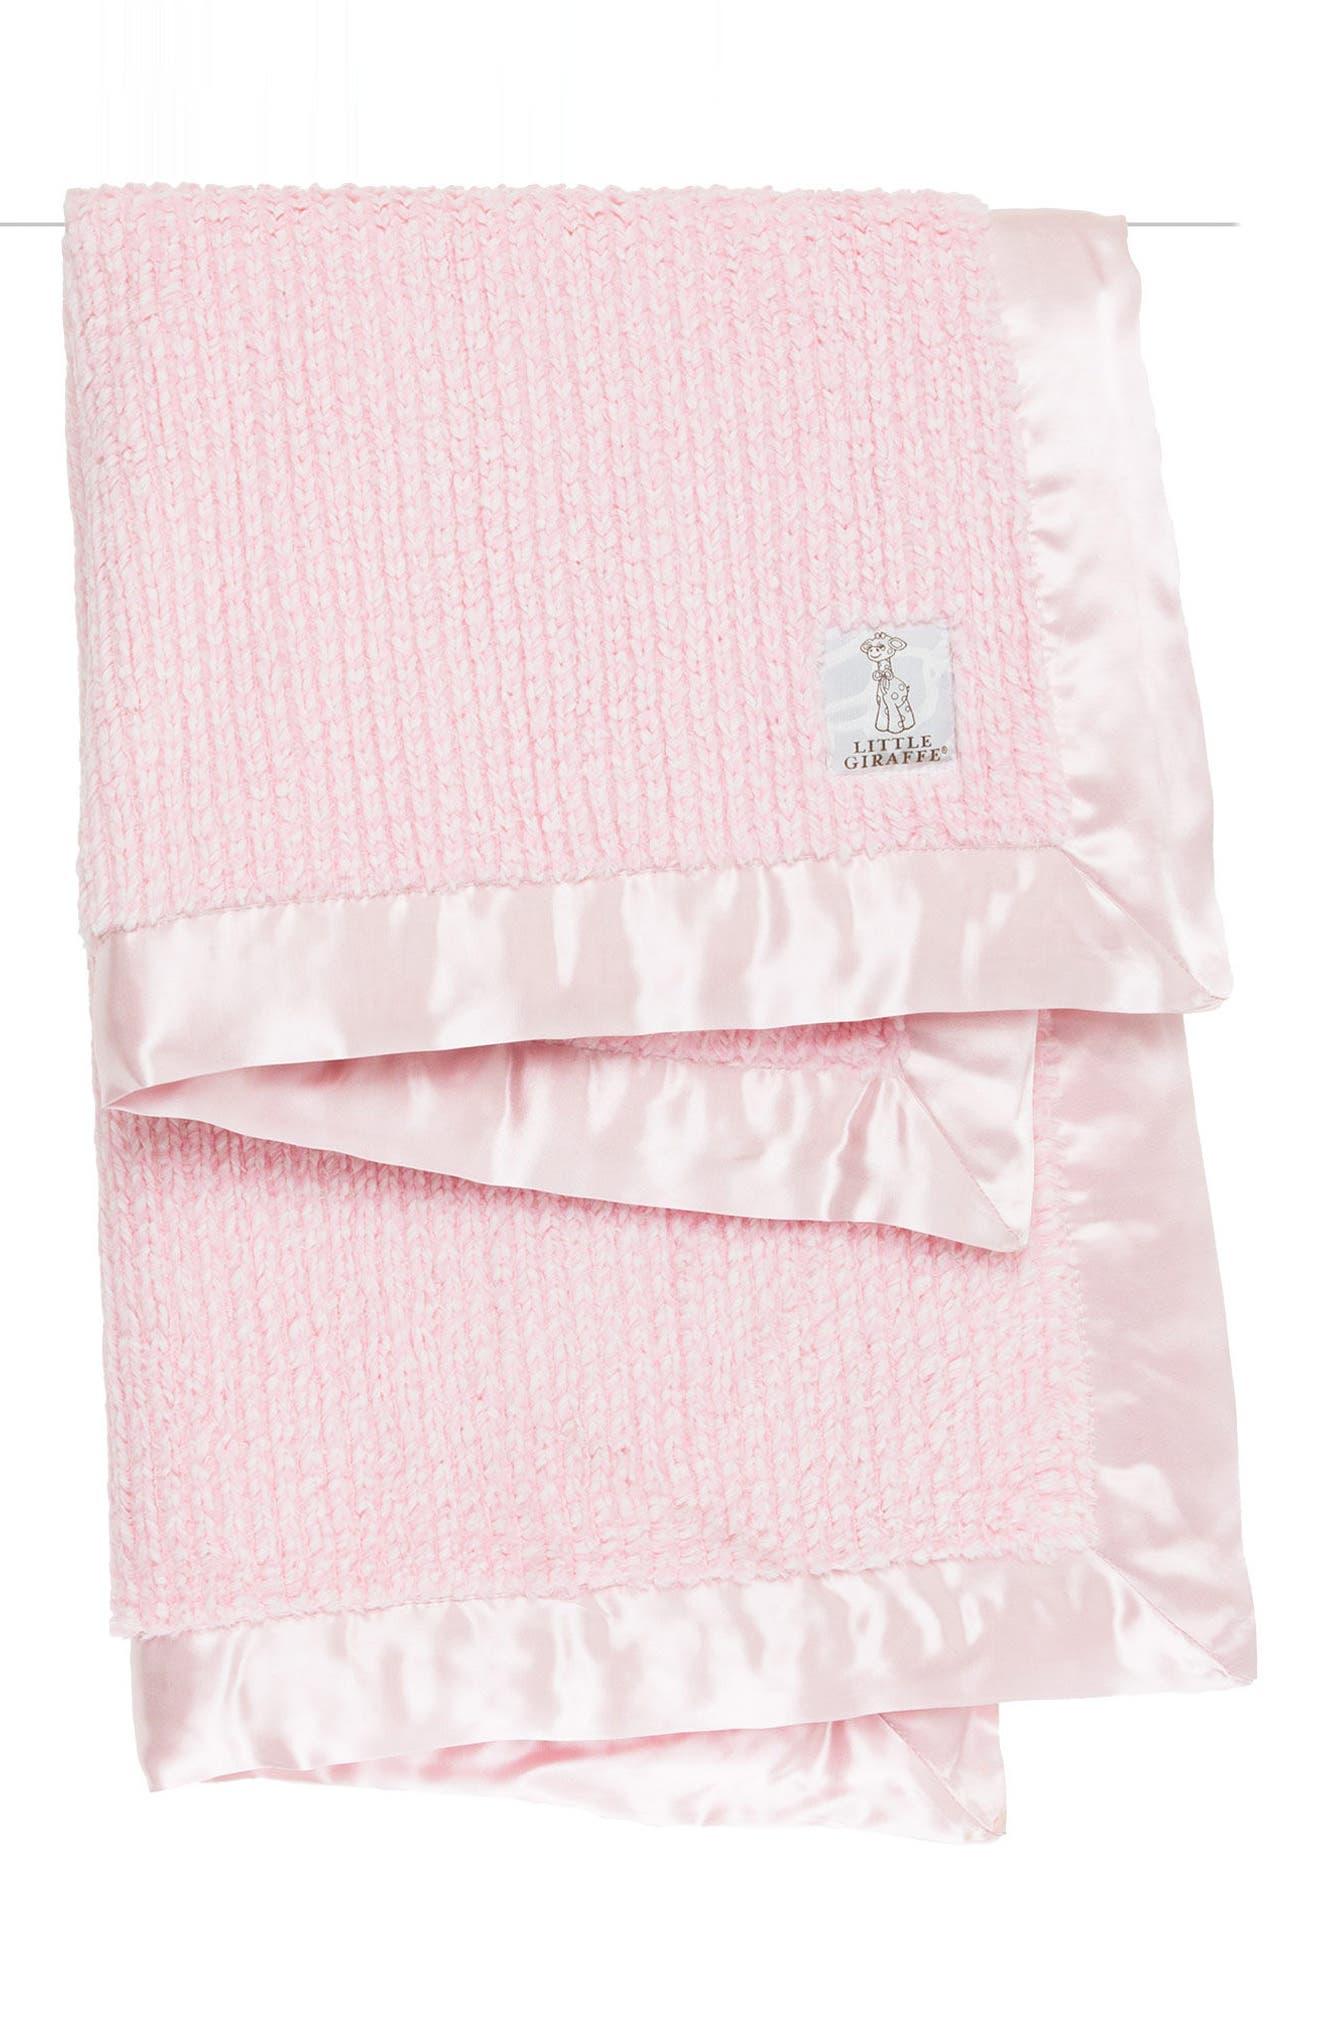 LITTLE GIRAFFE, Luxe Herringbone Blanket, Main thumbnail 1, color, PINK